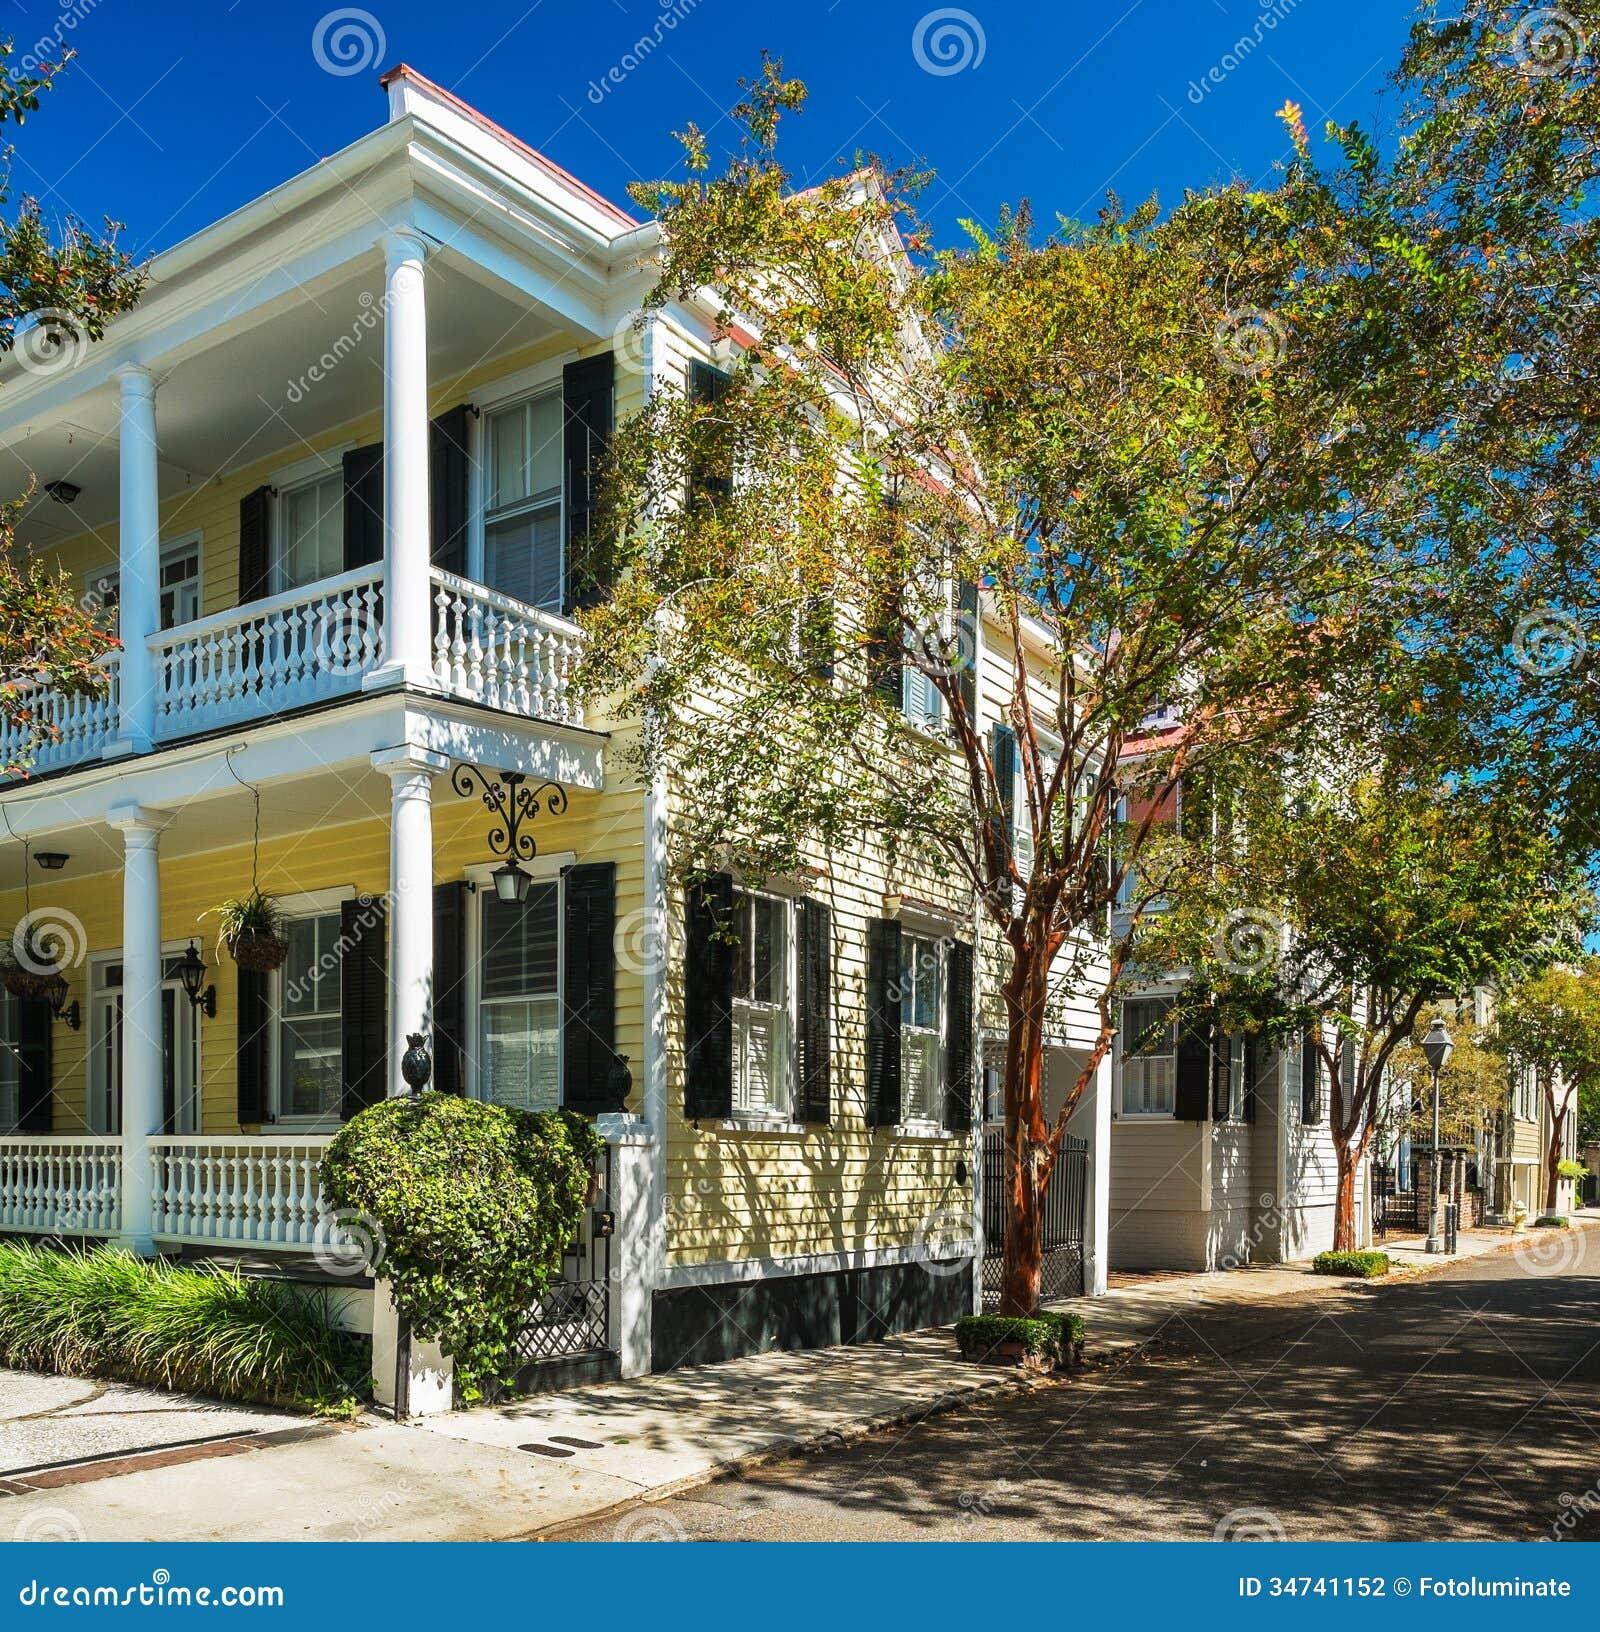 Charleston Sc Homes: Southern Homes Stock Photography